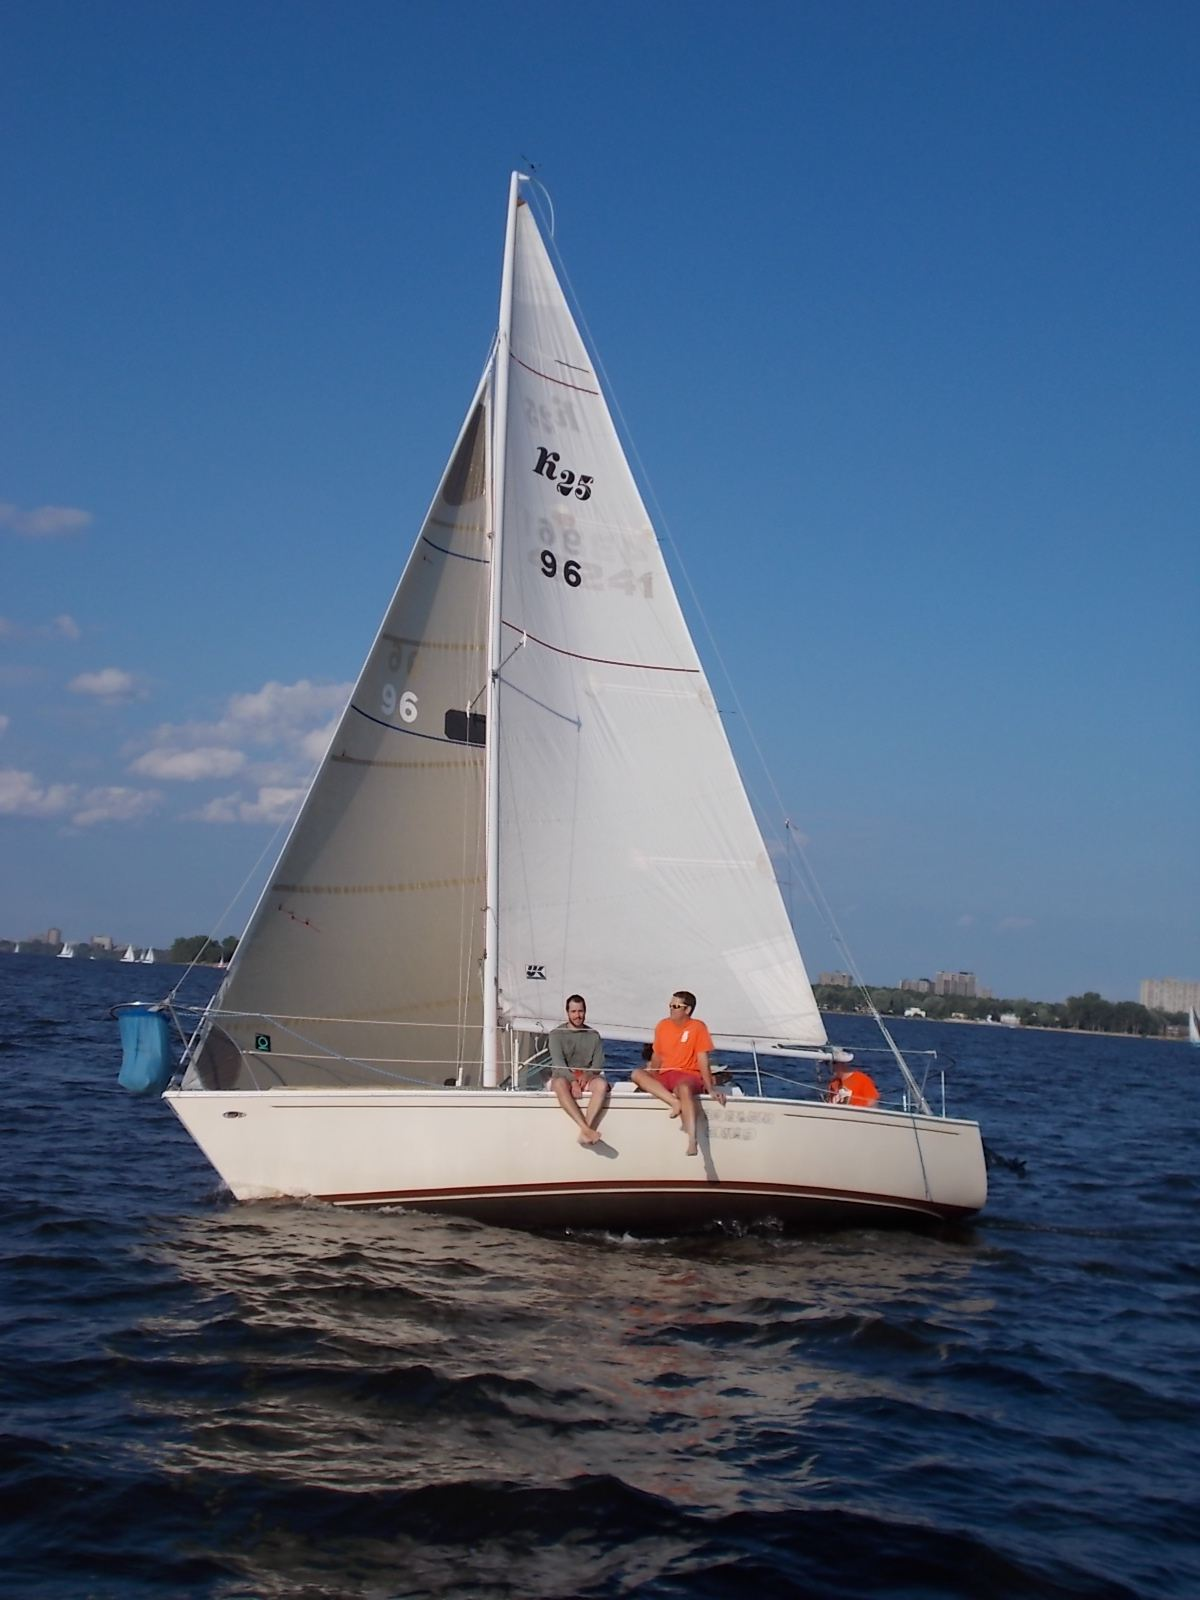 Kirby 25 sailboat